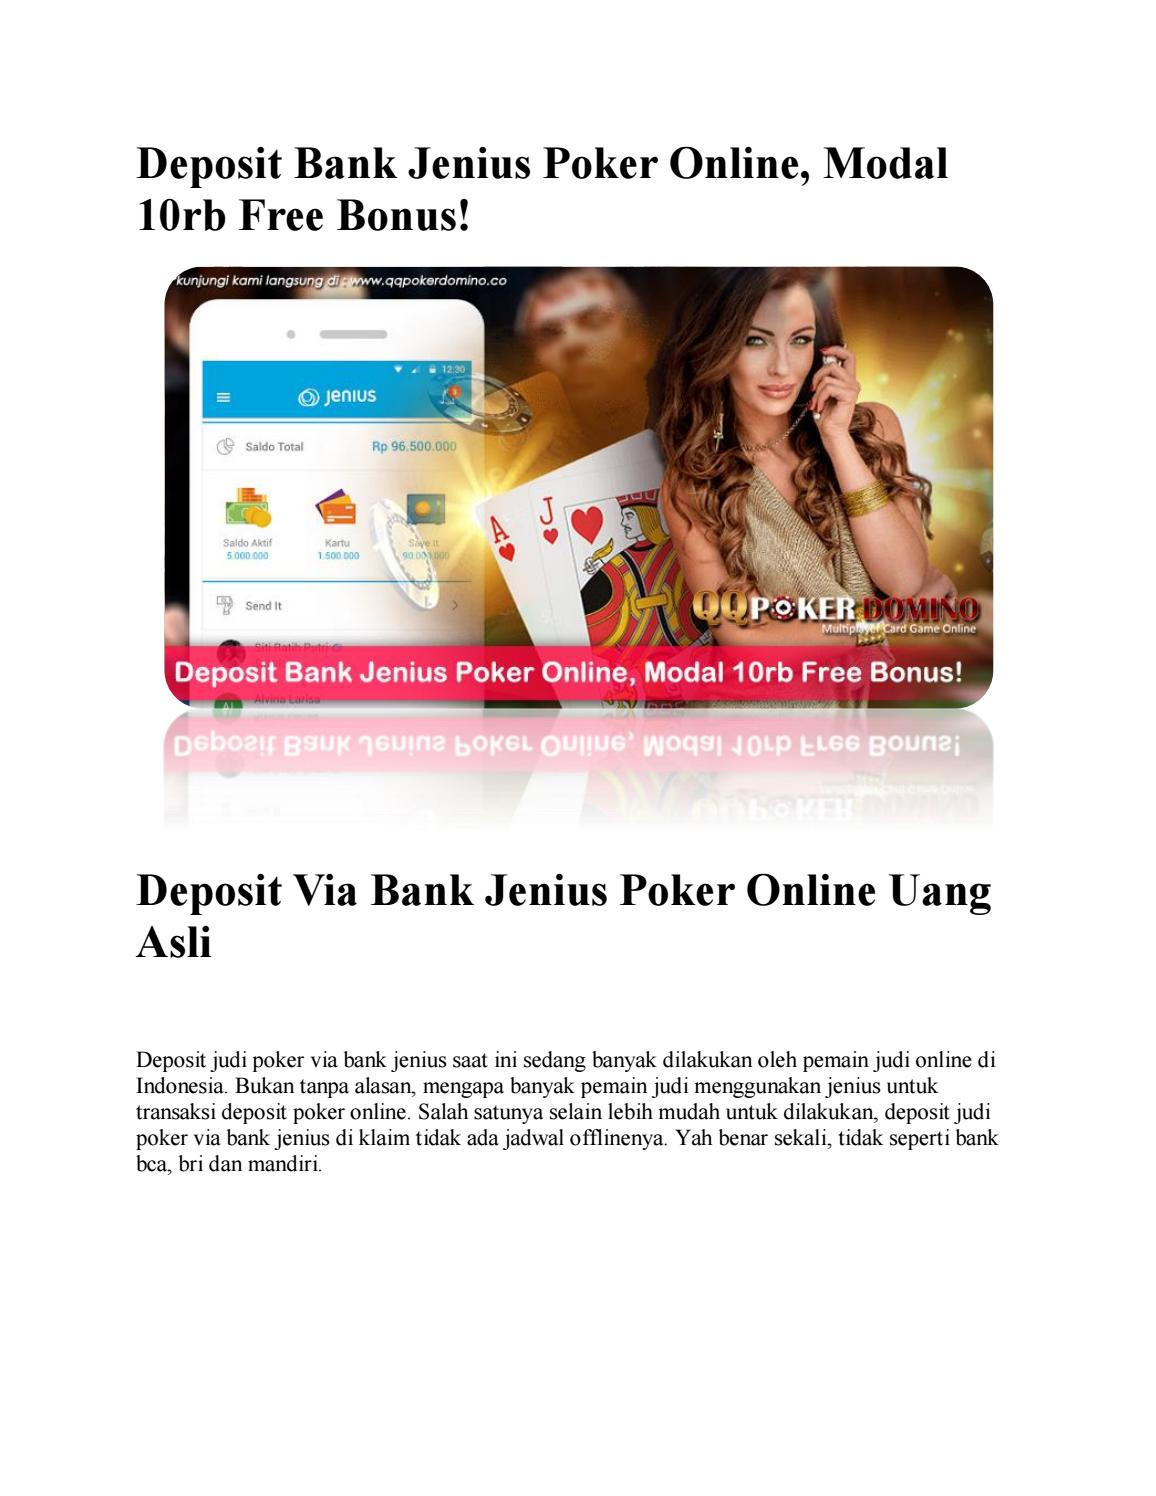 Deposit Bank Jenius Poker Online Modal 10rb Free Bonus By Anan Issuu